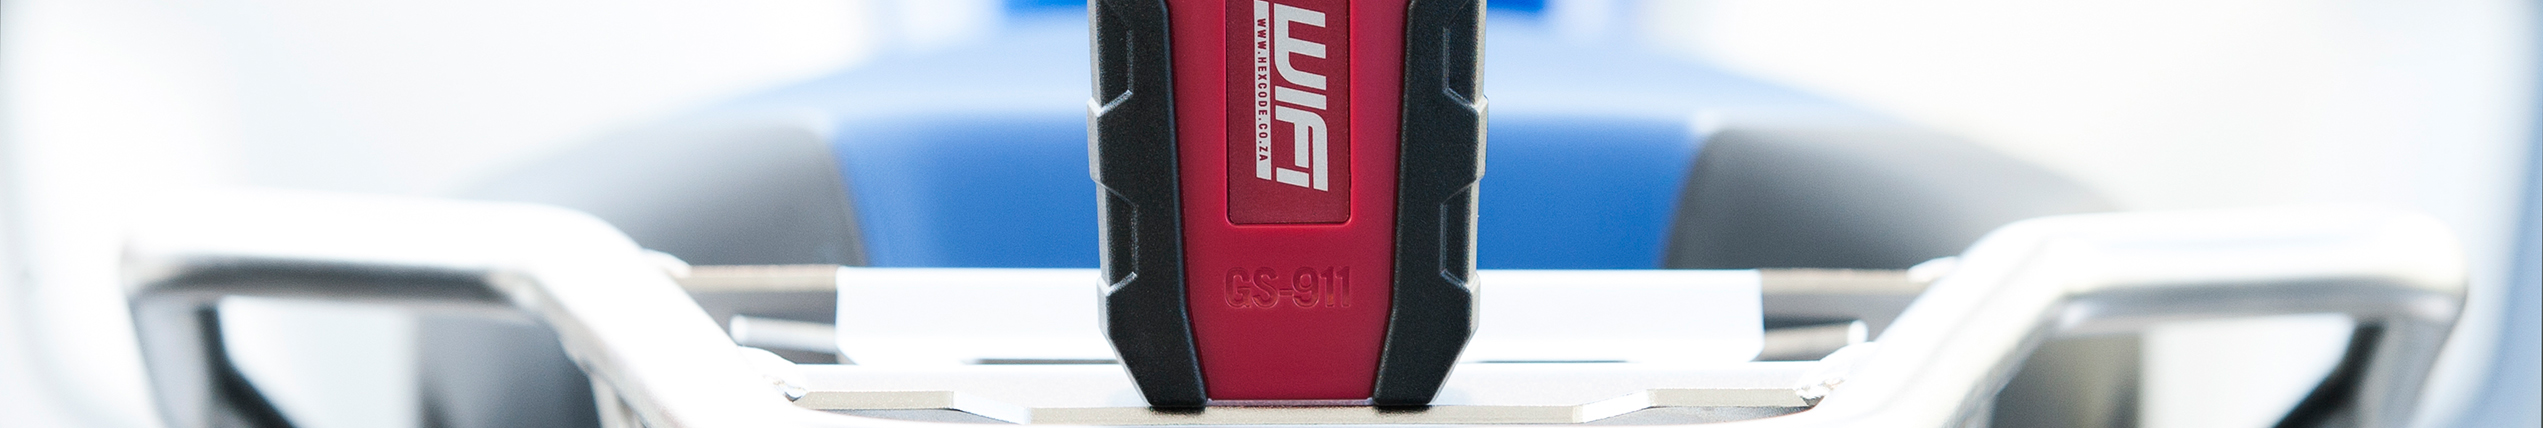 GS911